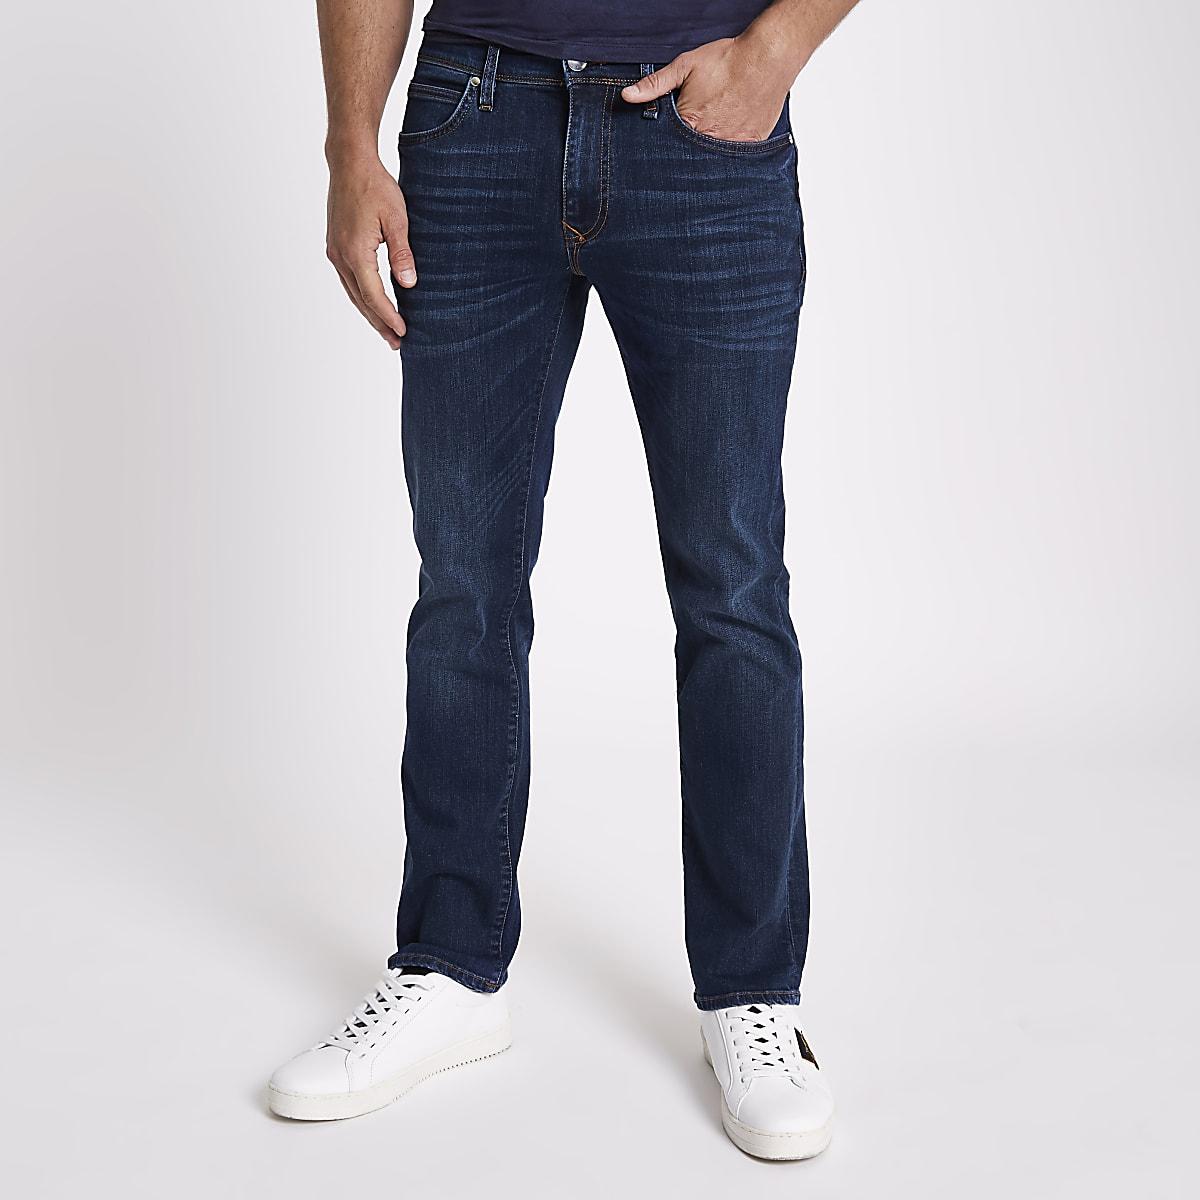 Dark blue bootcut jeans